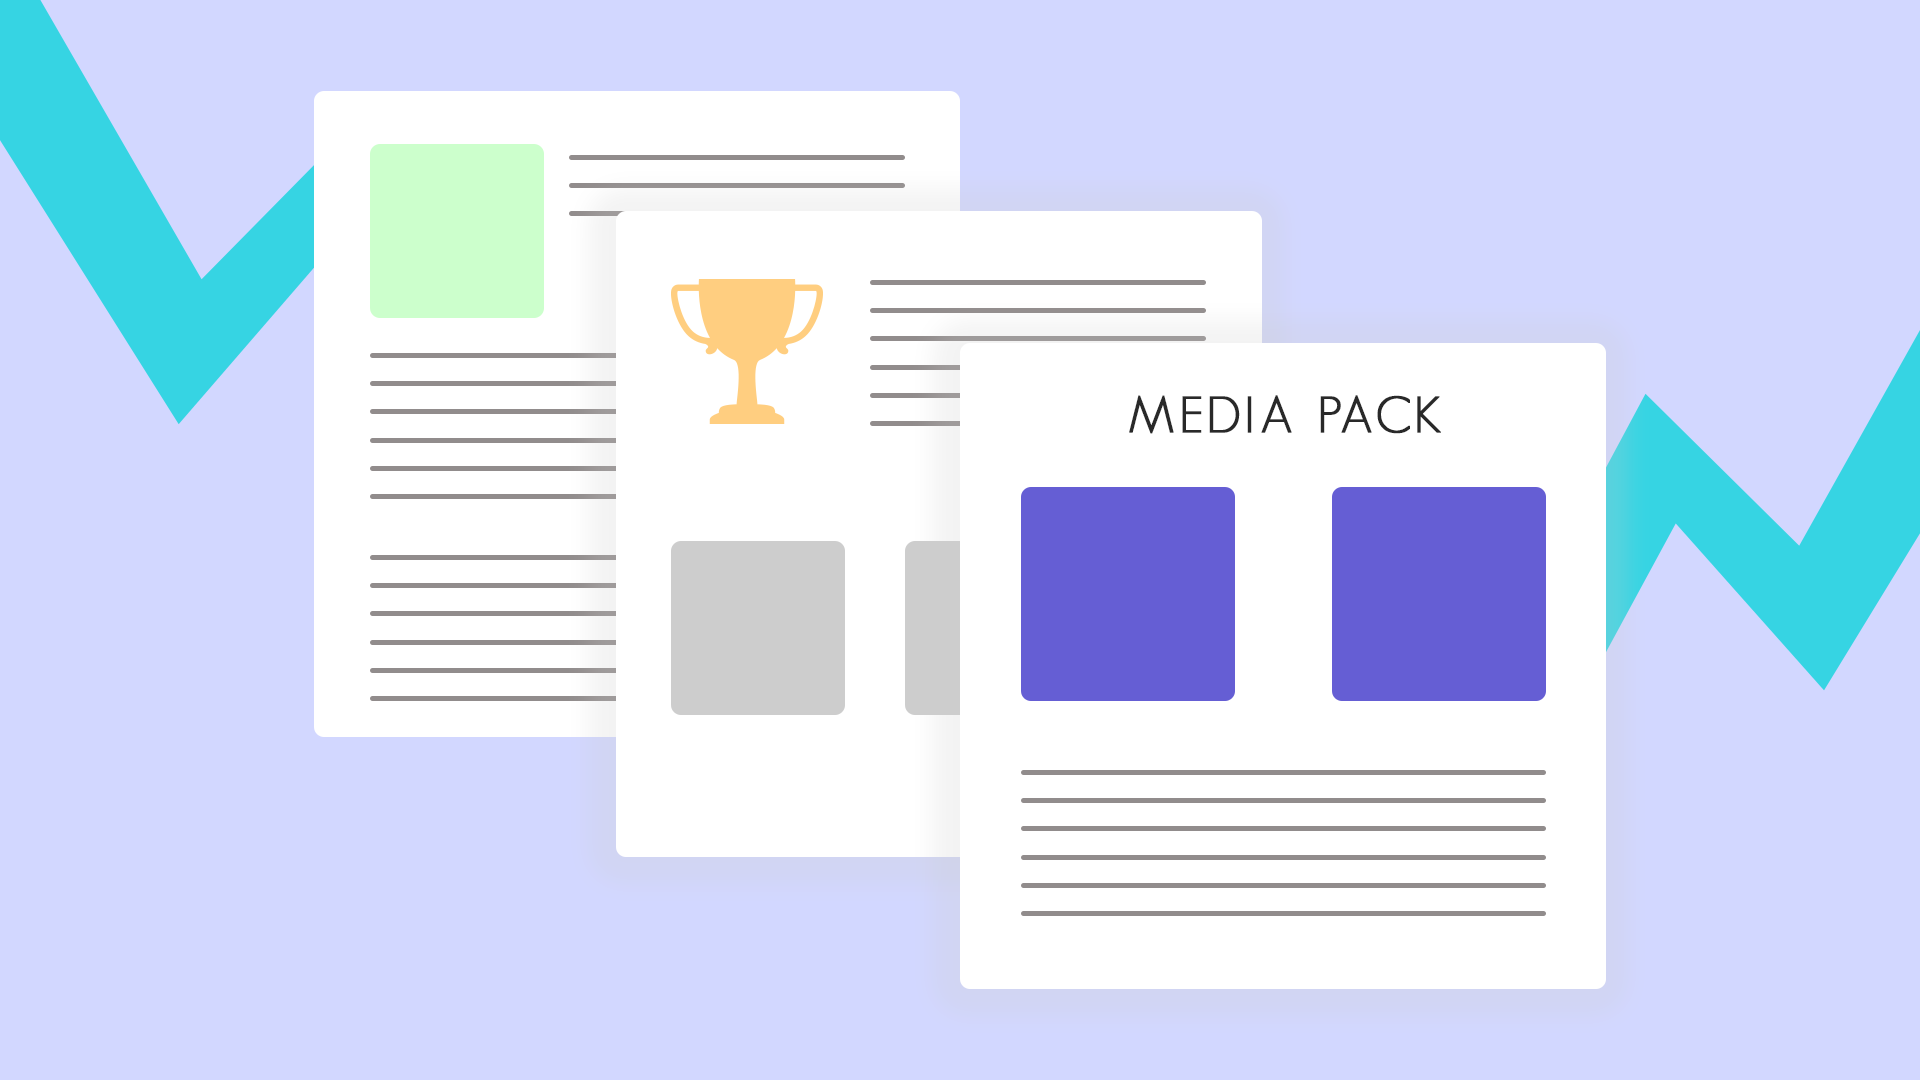 mediapack.png